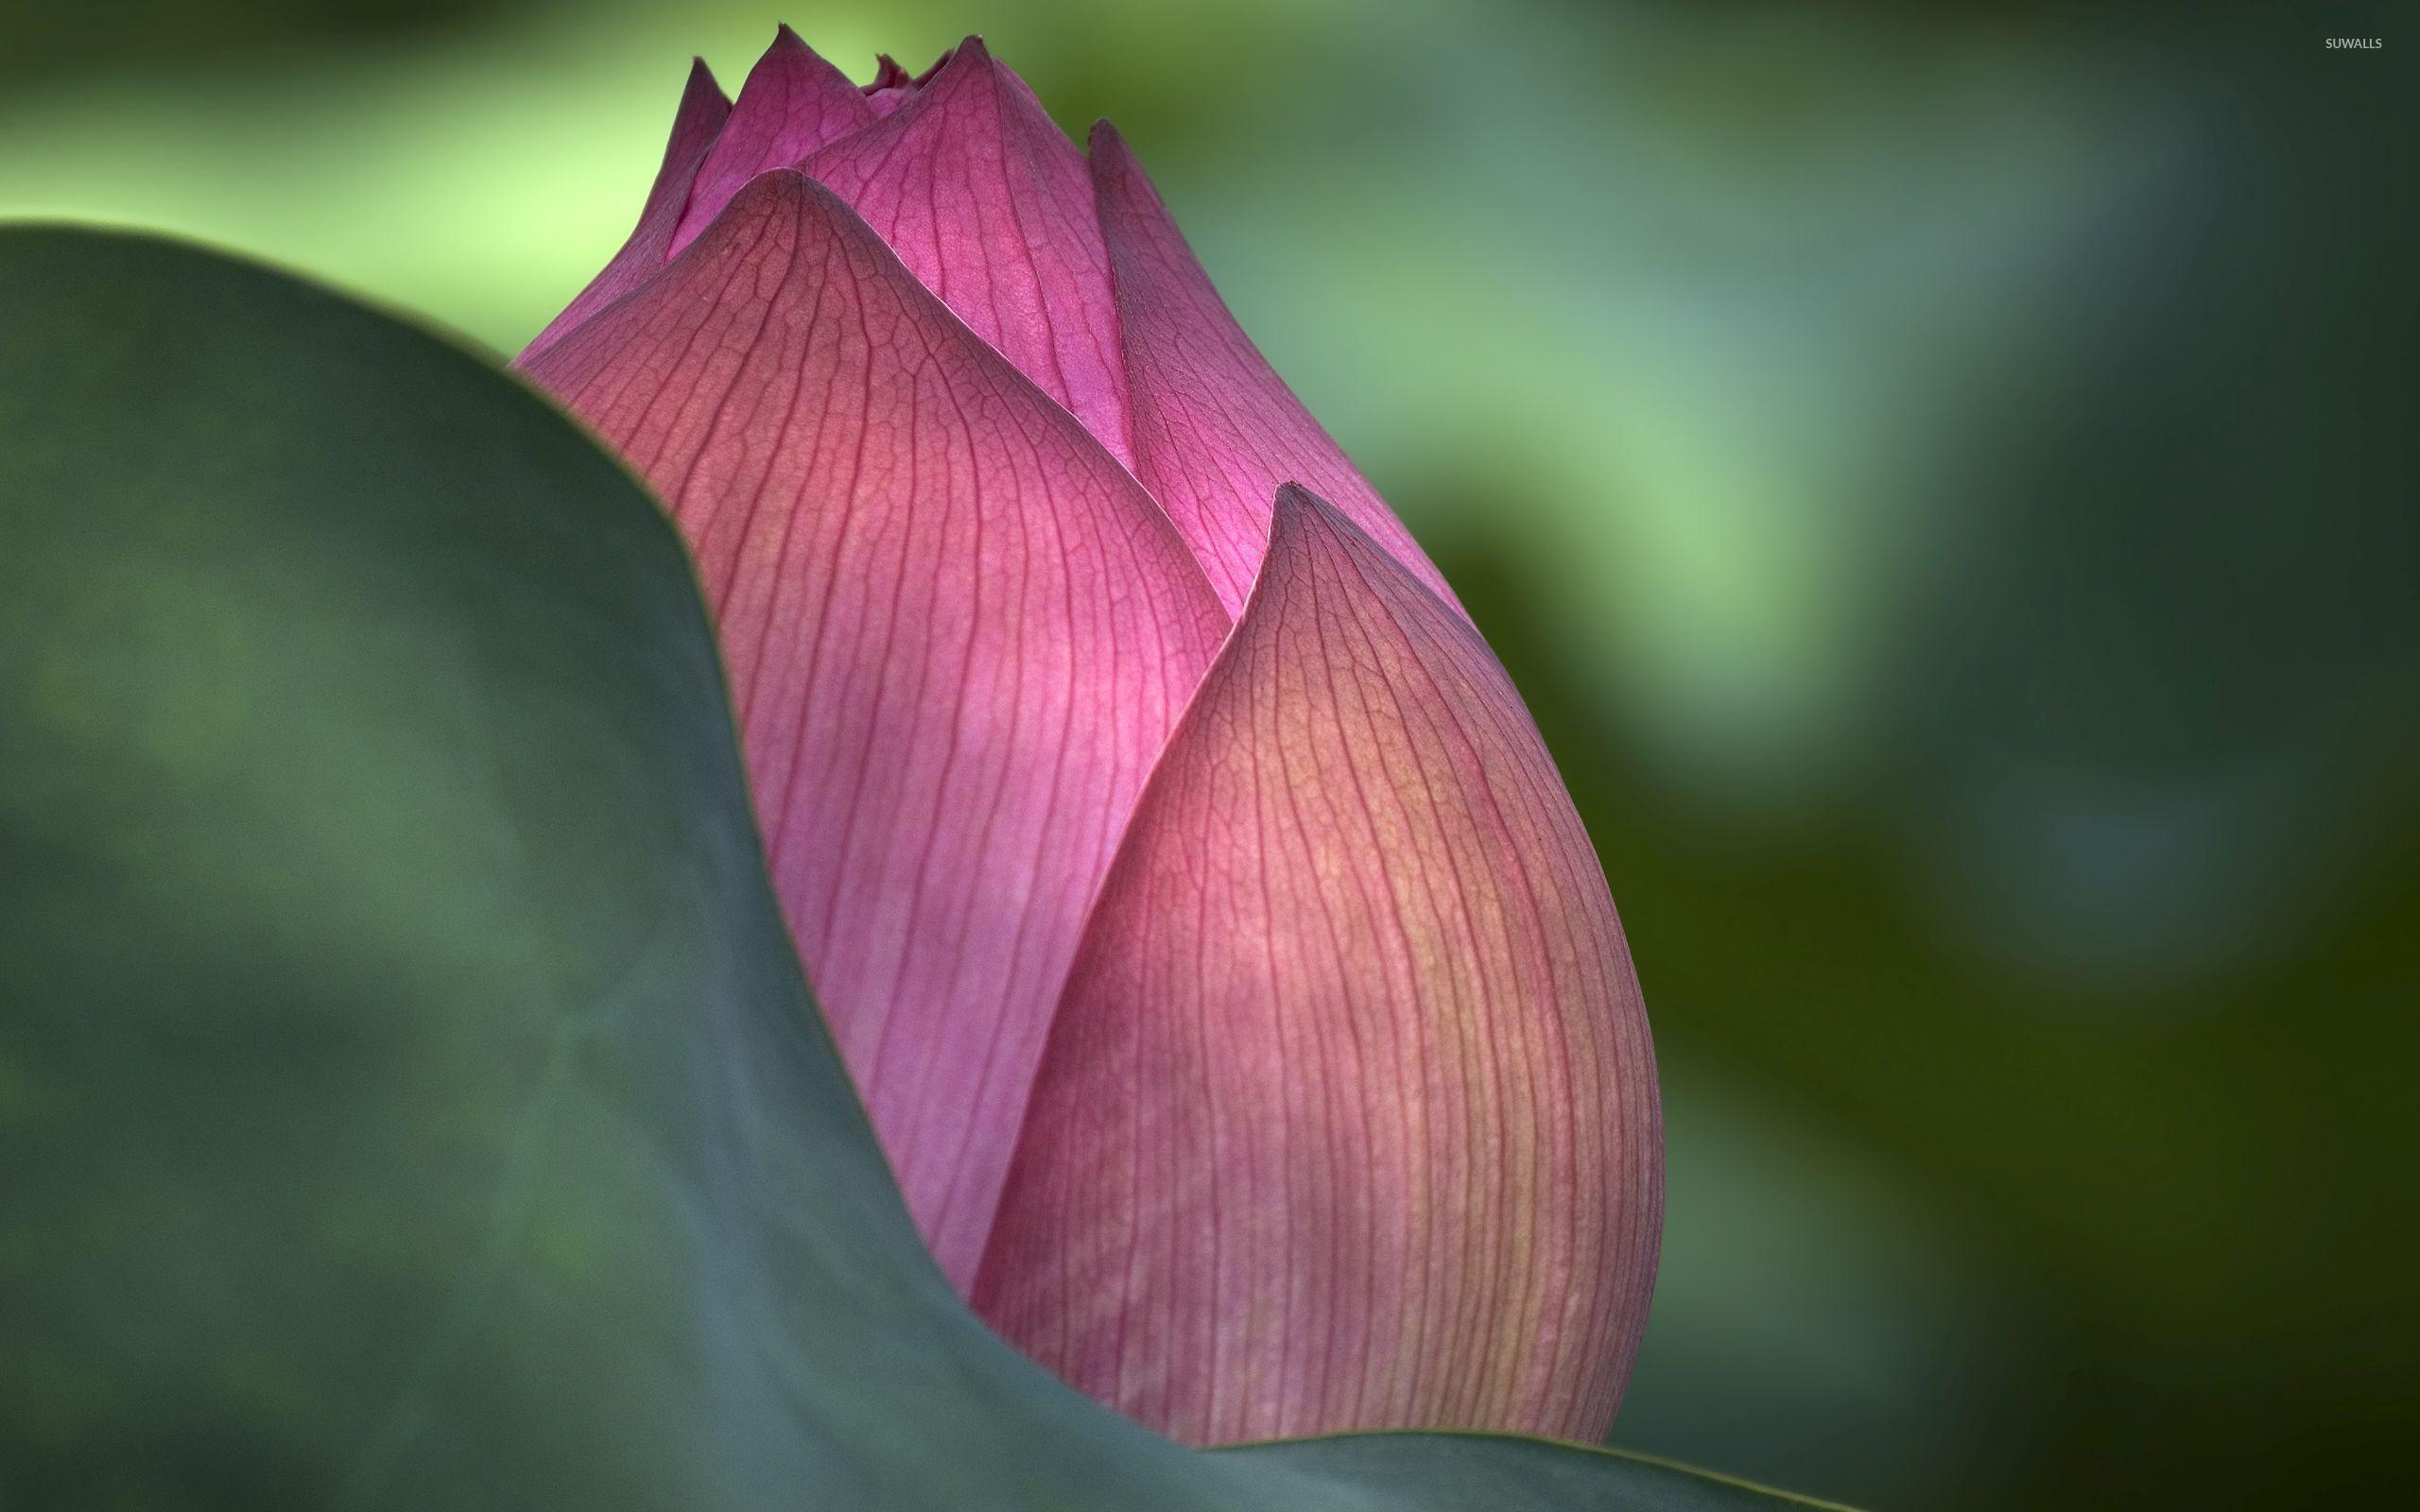 Amazing Lotus Bud Close Up Wallpaper